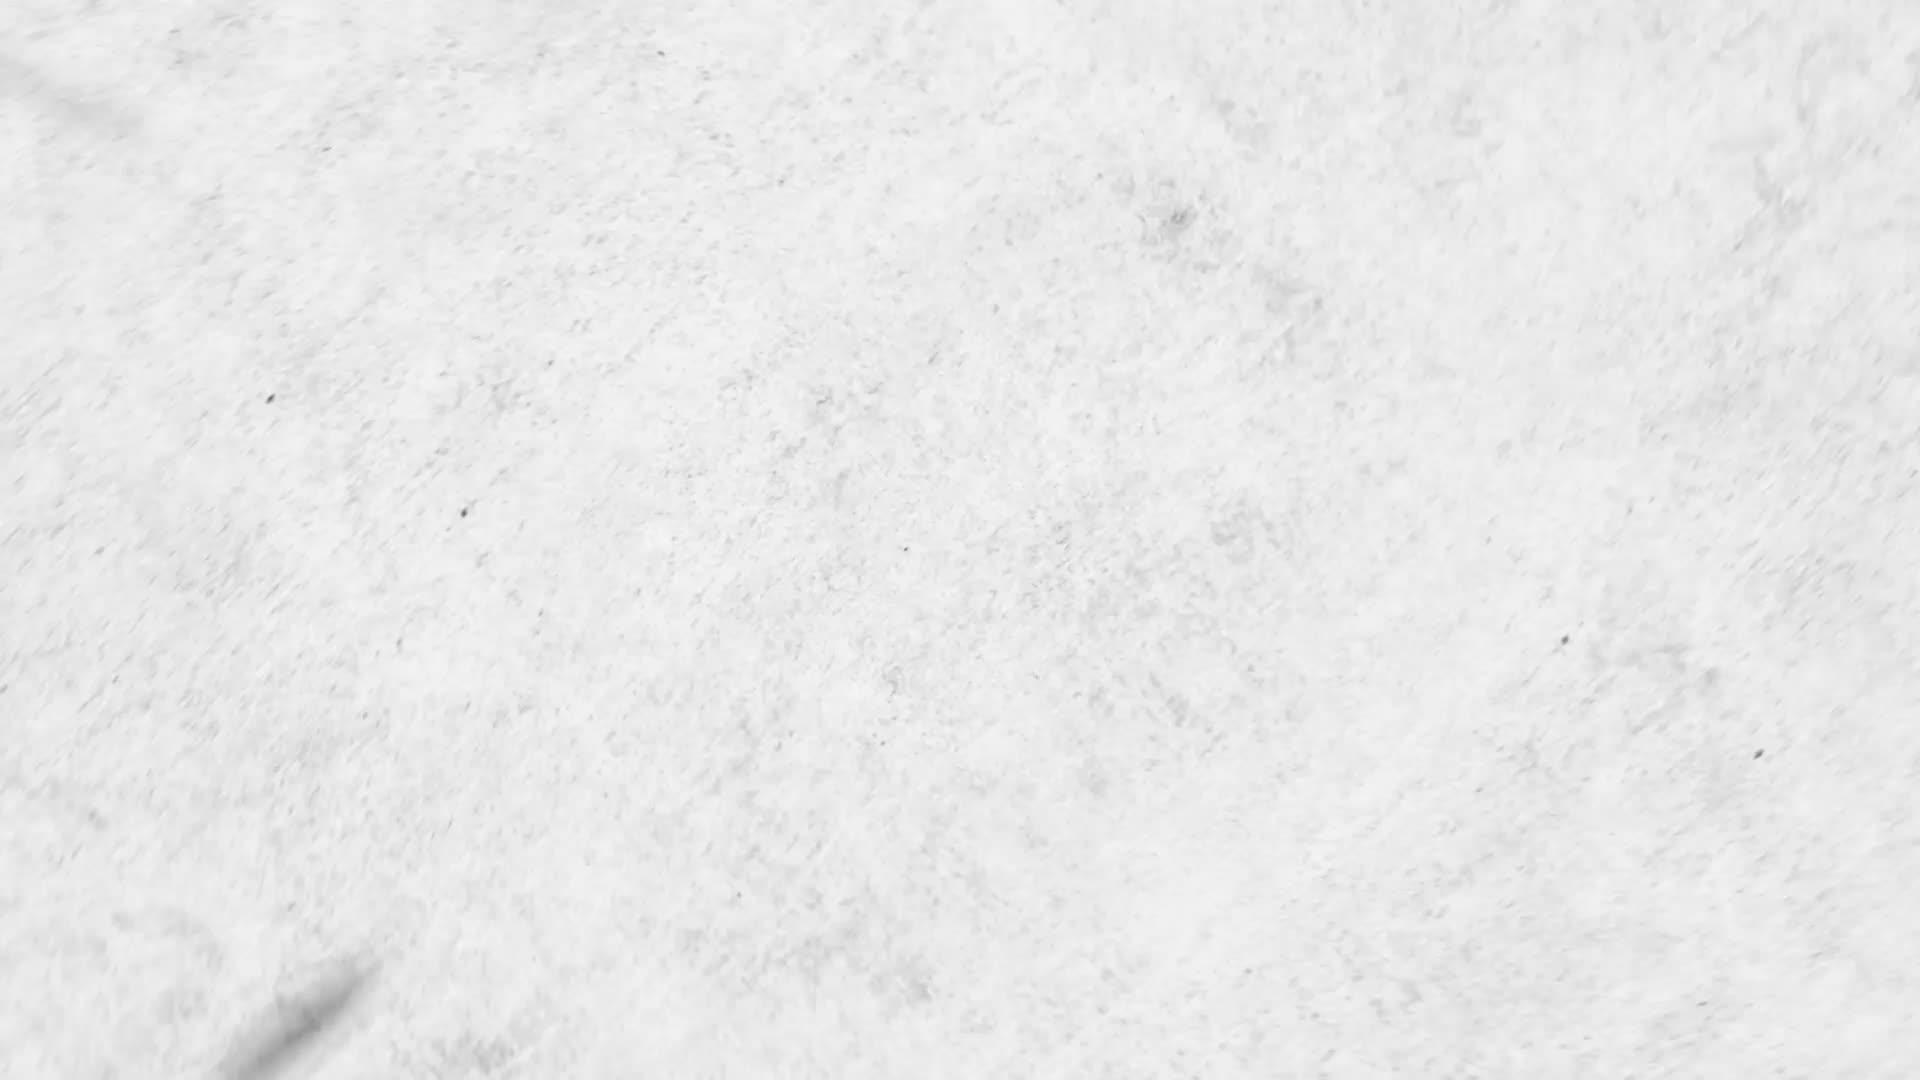 summer lax, Austin Case - Lacrosse Intro GIFs